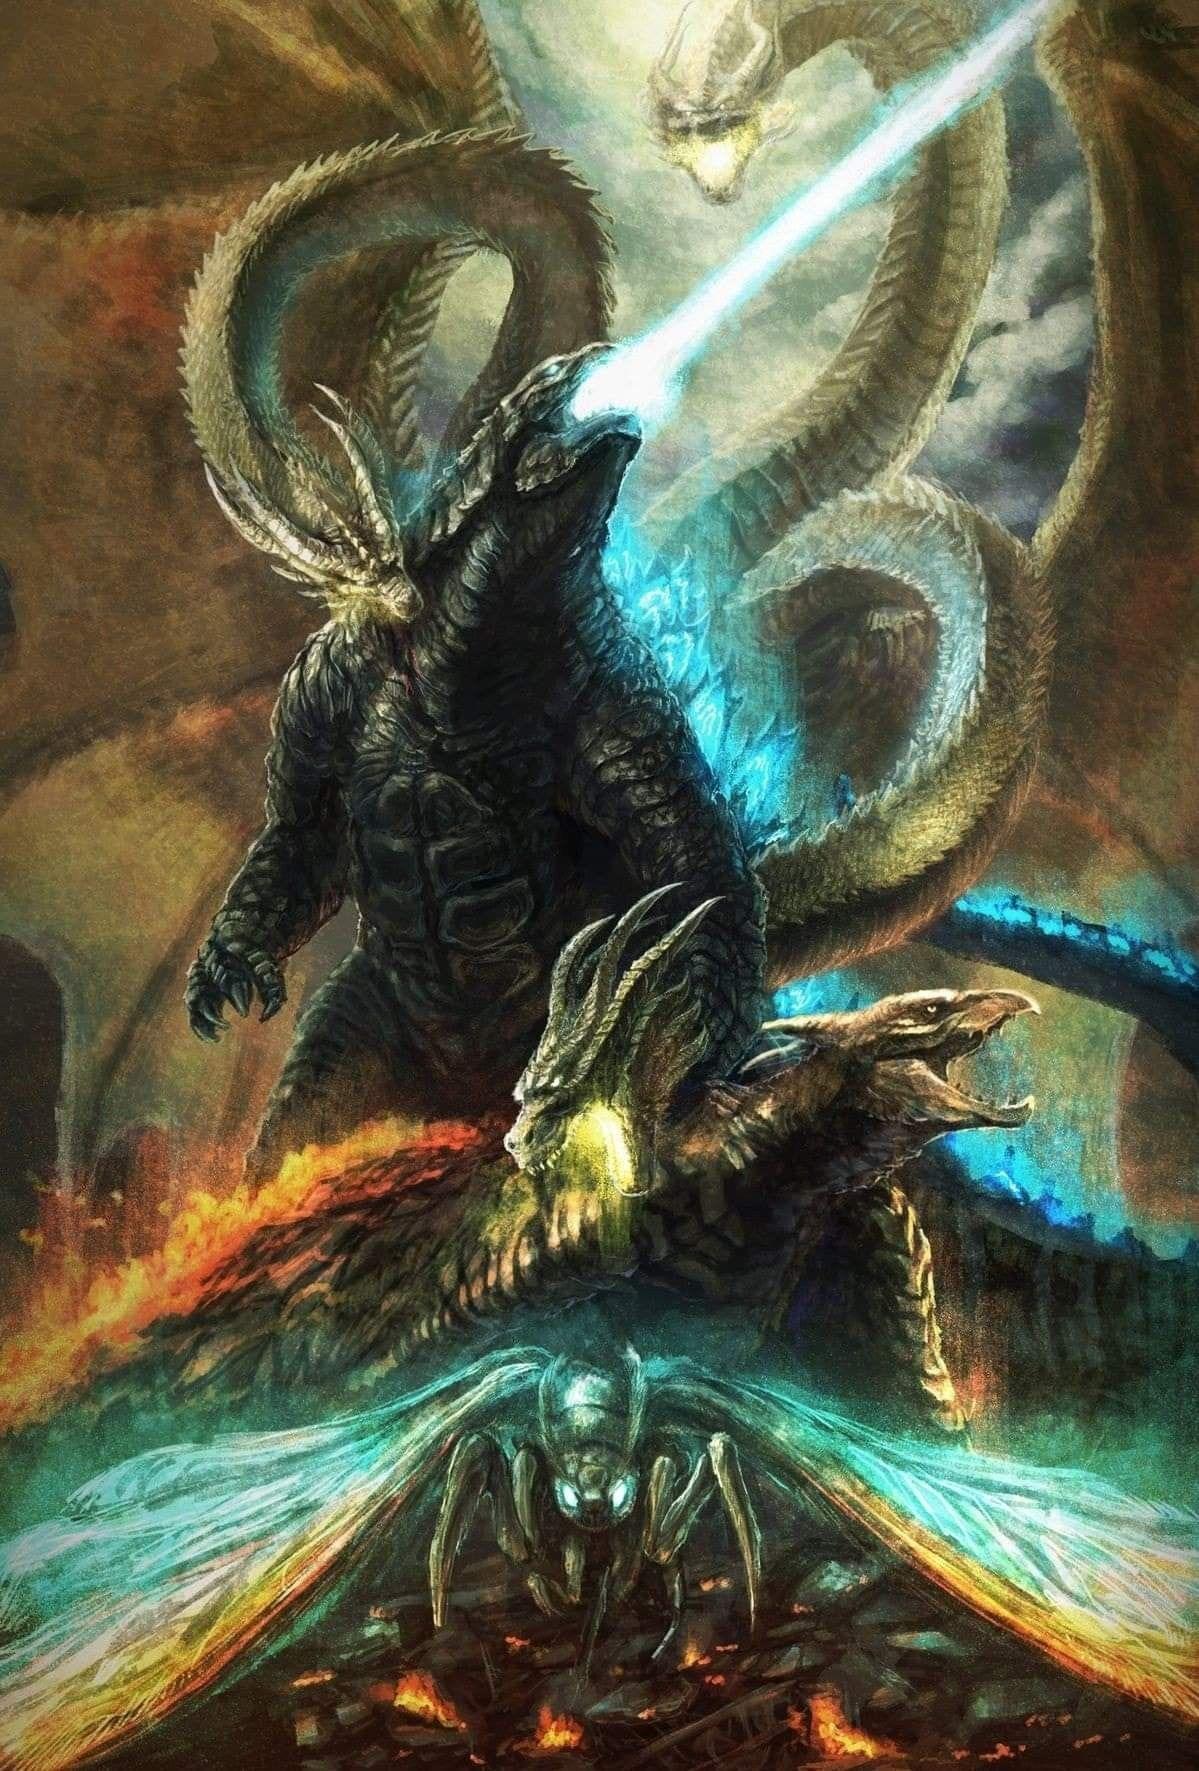 Pin de Bruno Santa Helena em Godzilla   Monstros, Godzilla